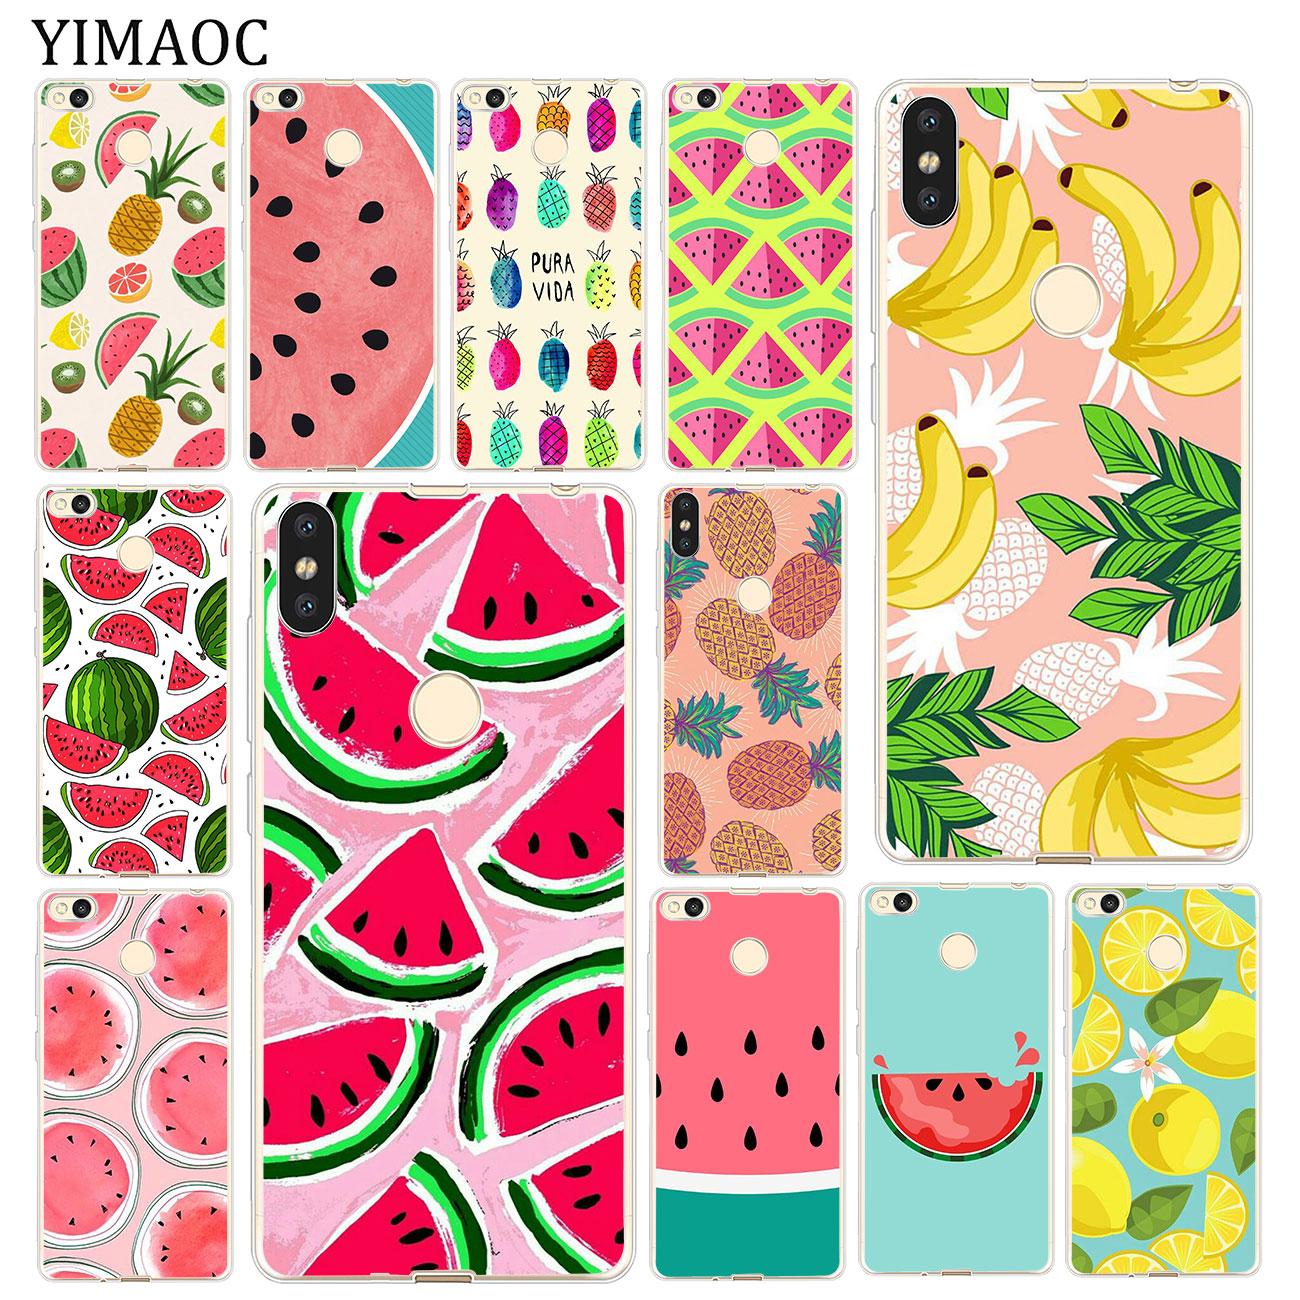 Funda blanda YIMAOC banana sandía fruta verano para Xiaomi mi Red mi 8A 7A 6A 5A 4X Note 8 7 6 Pro 5 Plus